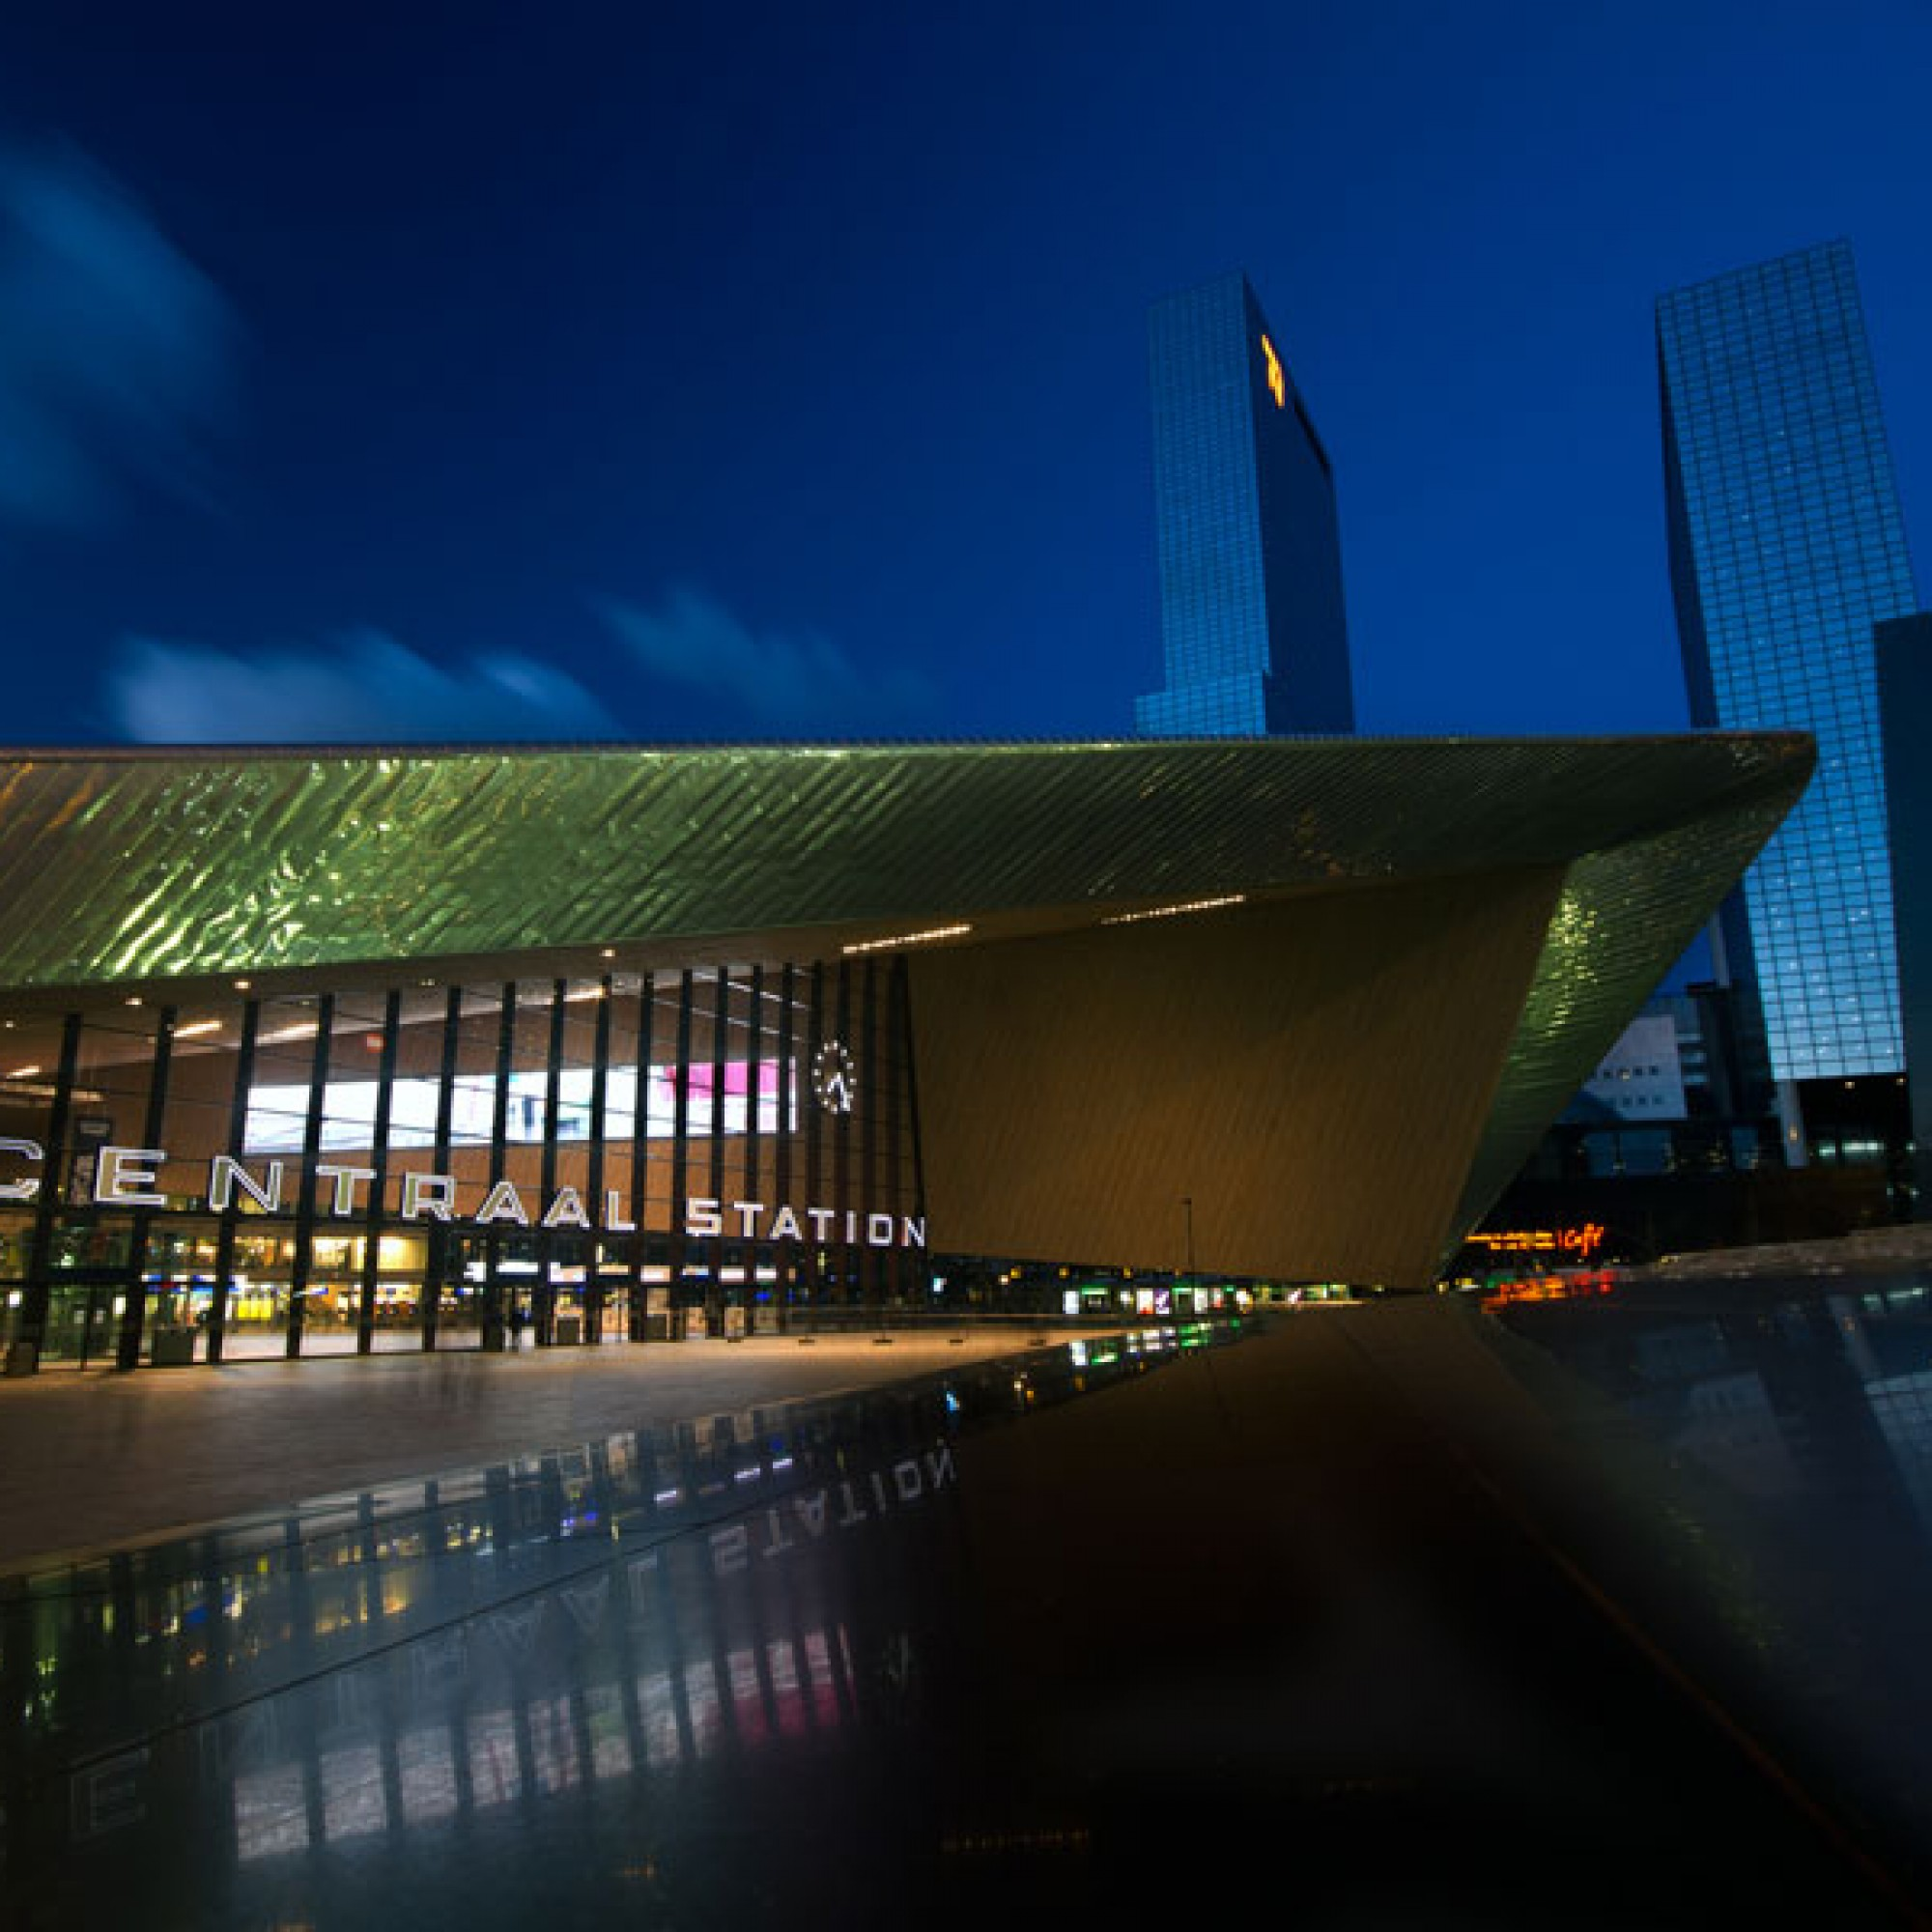 Rotterdam Centraal Station, Michal Switala